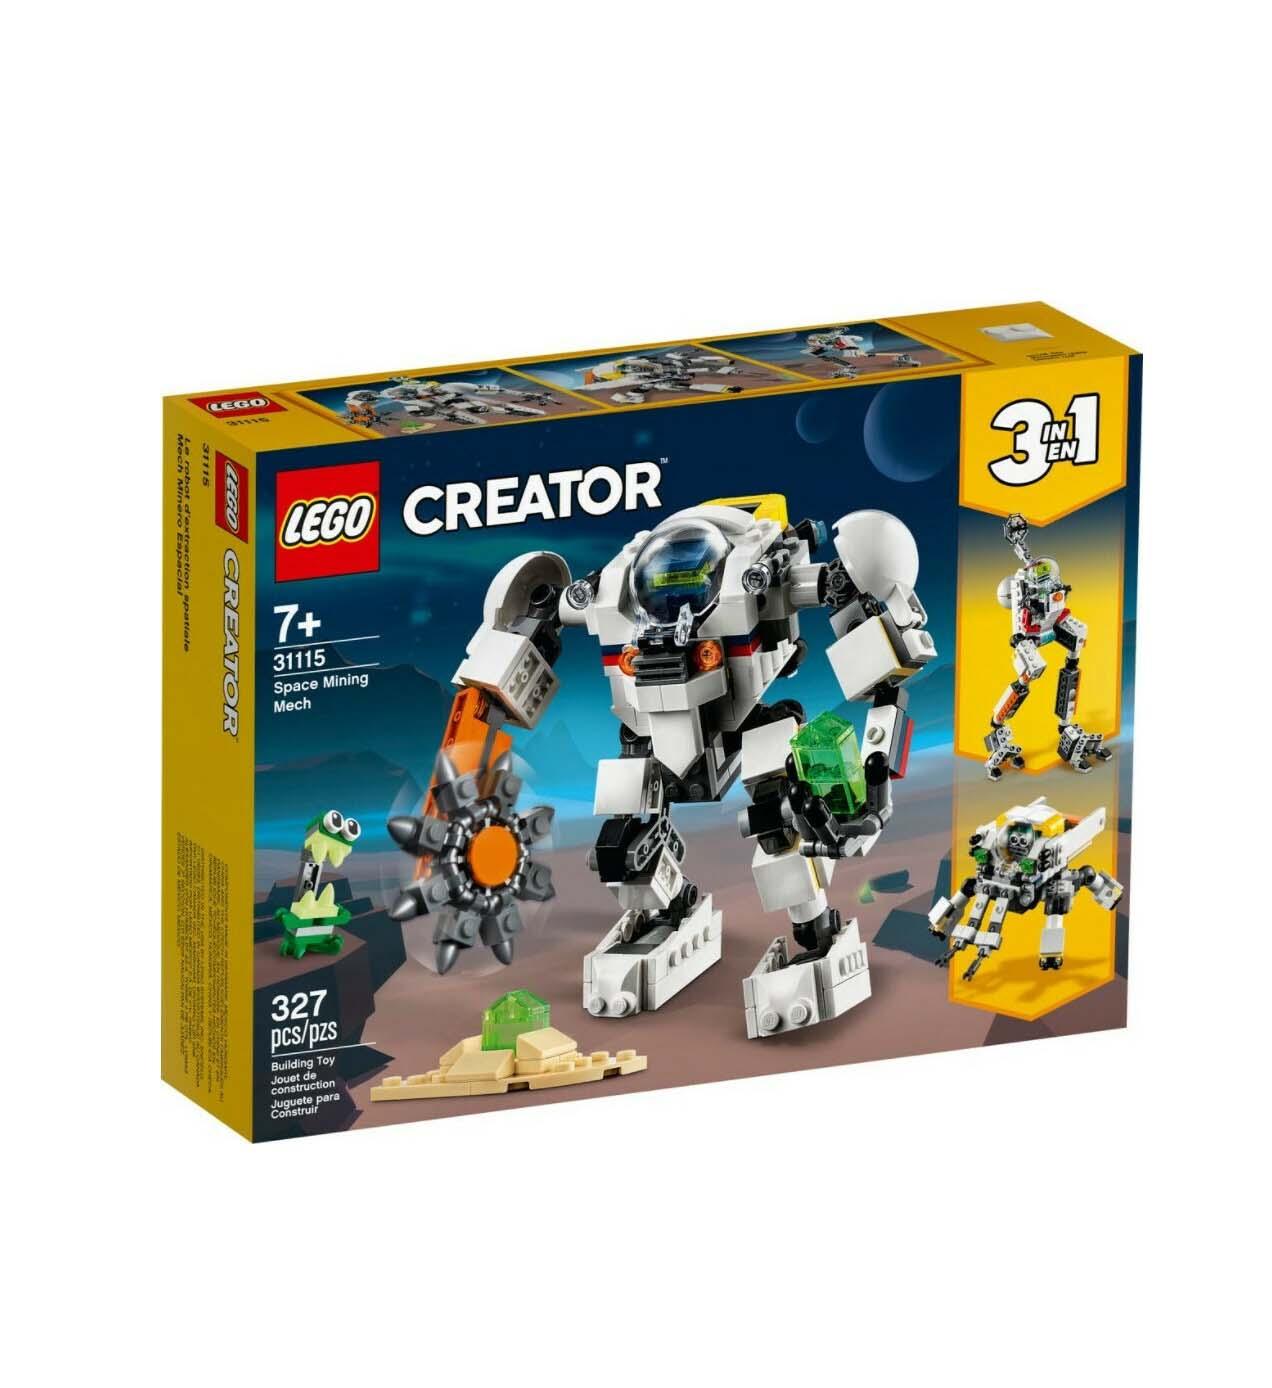 Lego Creator: Space Mining Mech 31115